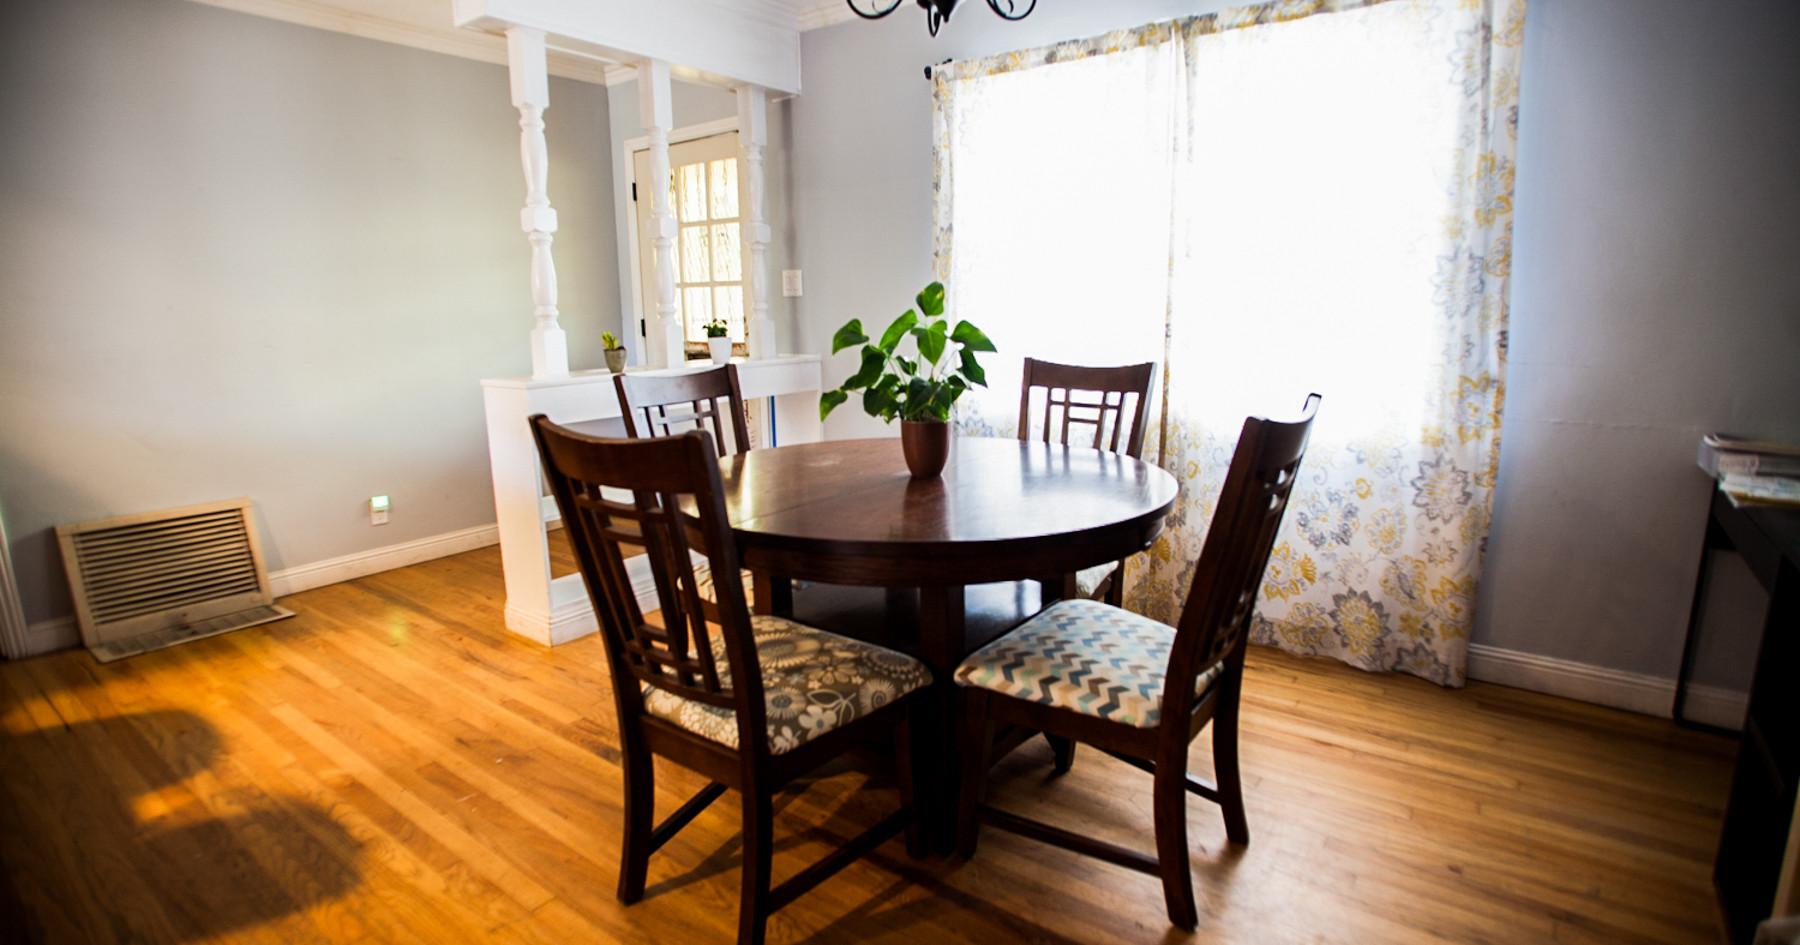 Dining Room at 79th Street